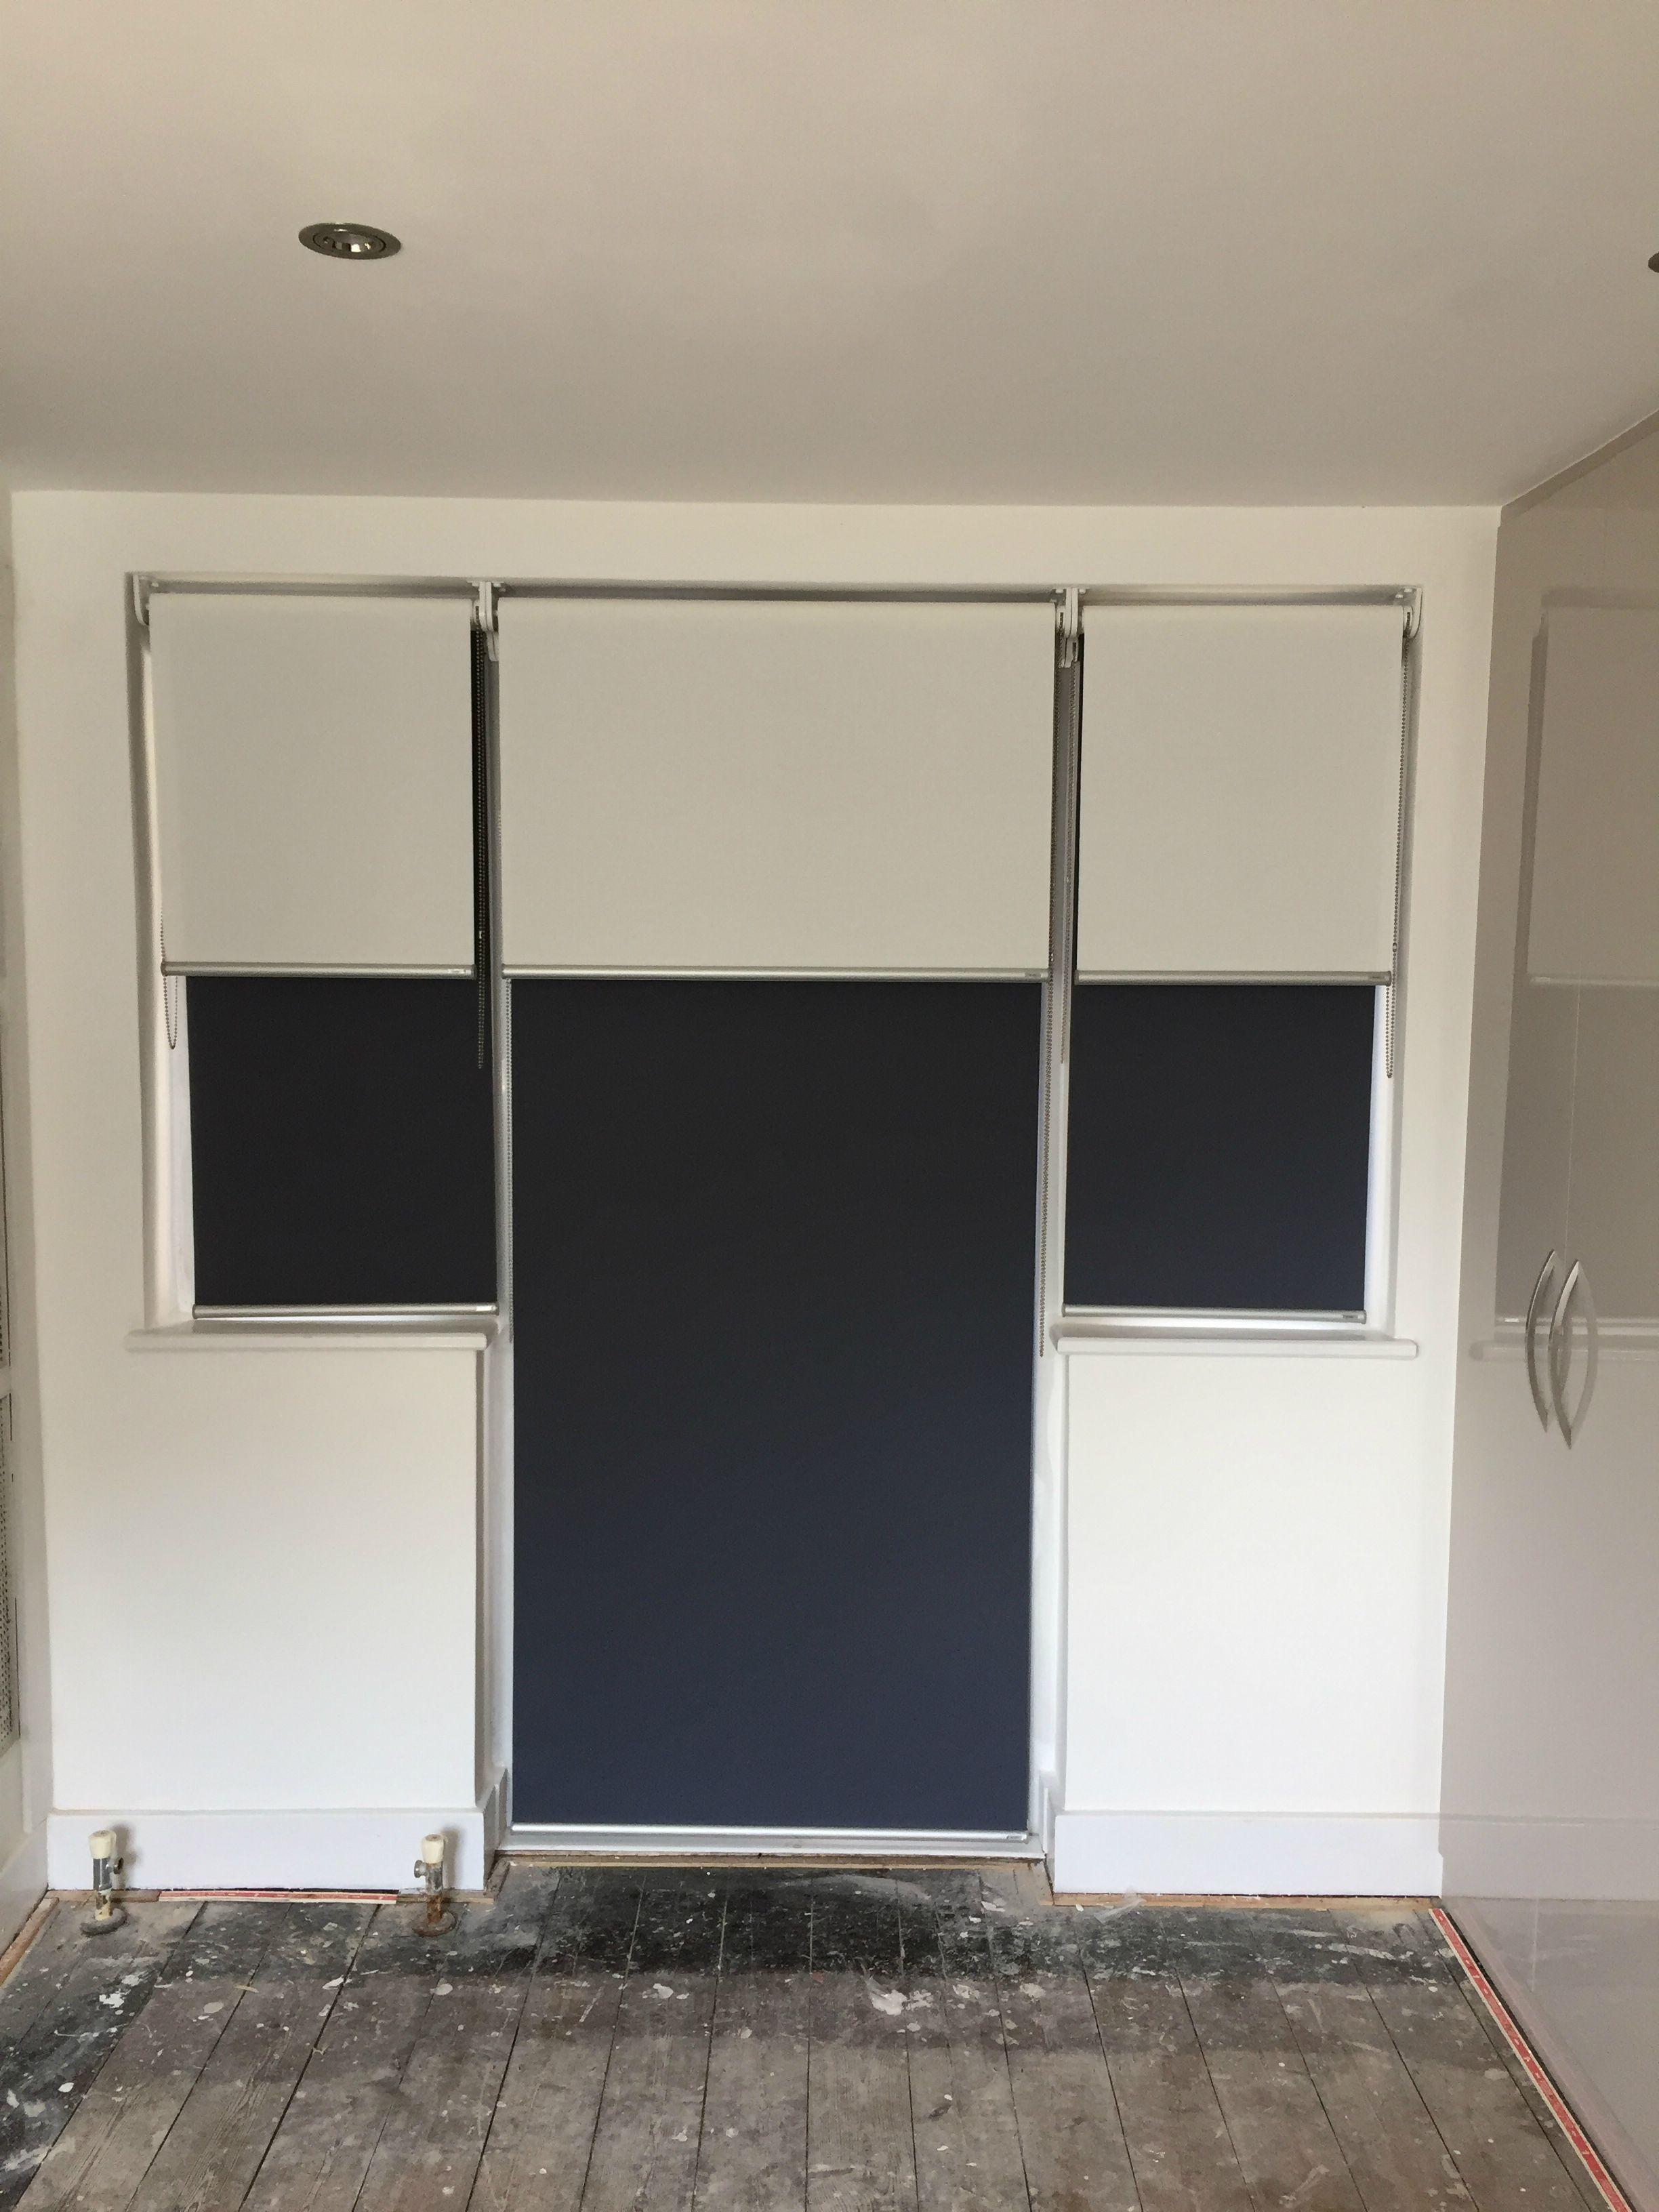 Doubledual roller blinds blackout and sunscreen roller blinds